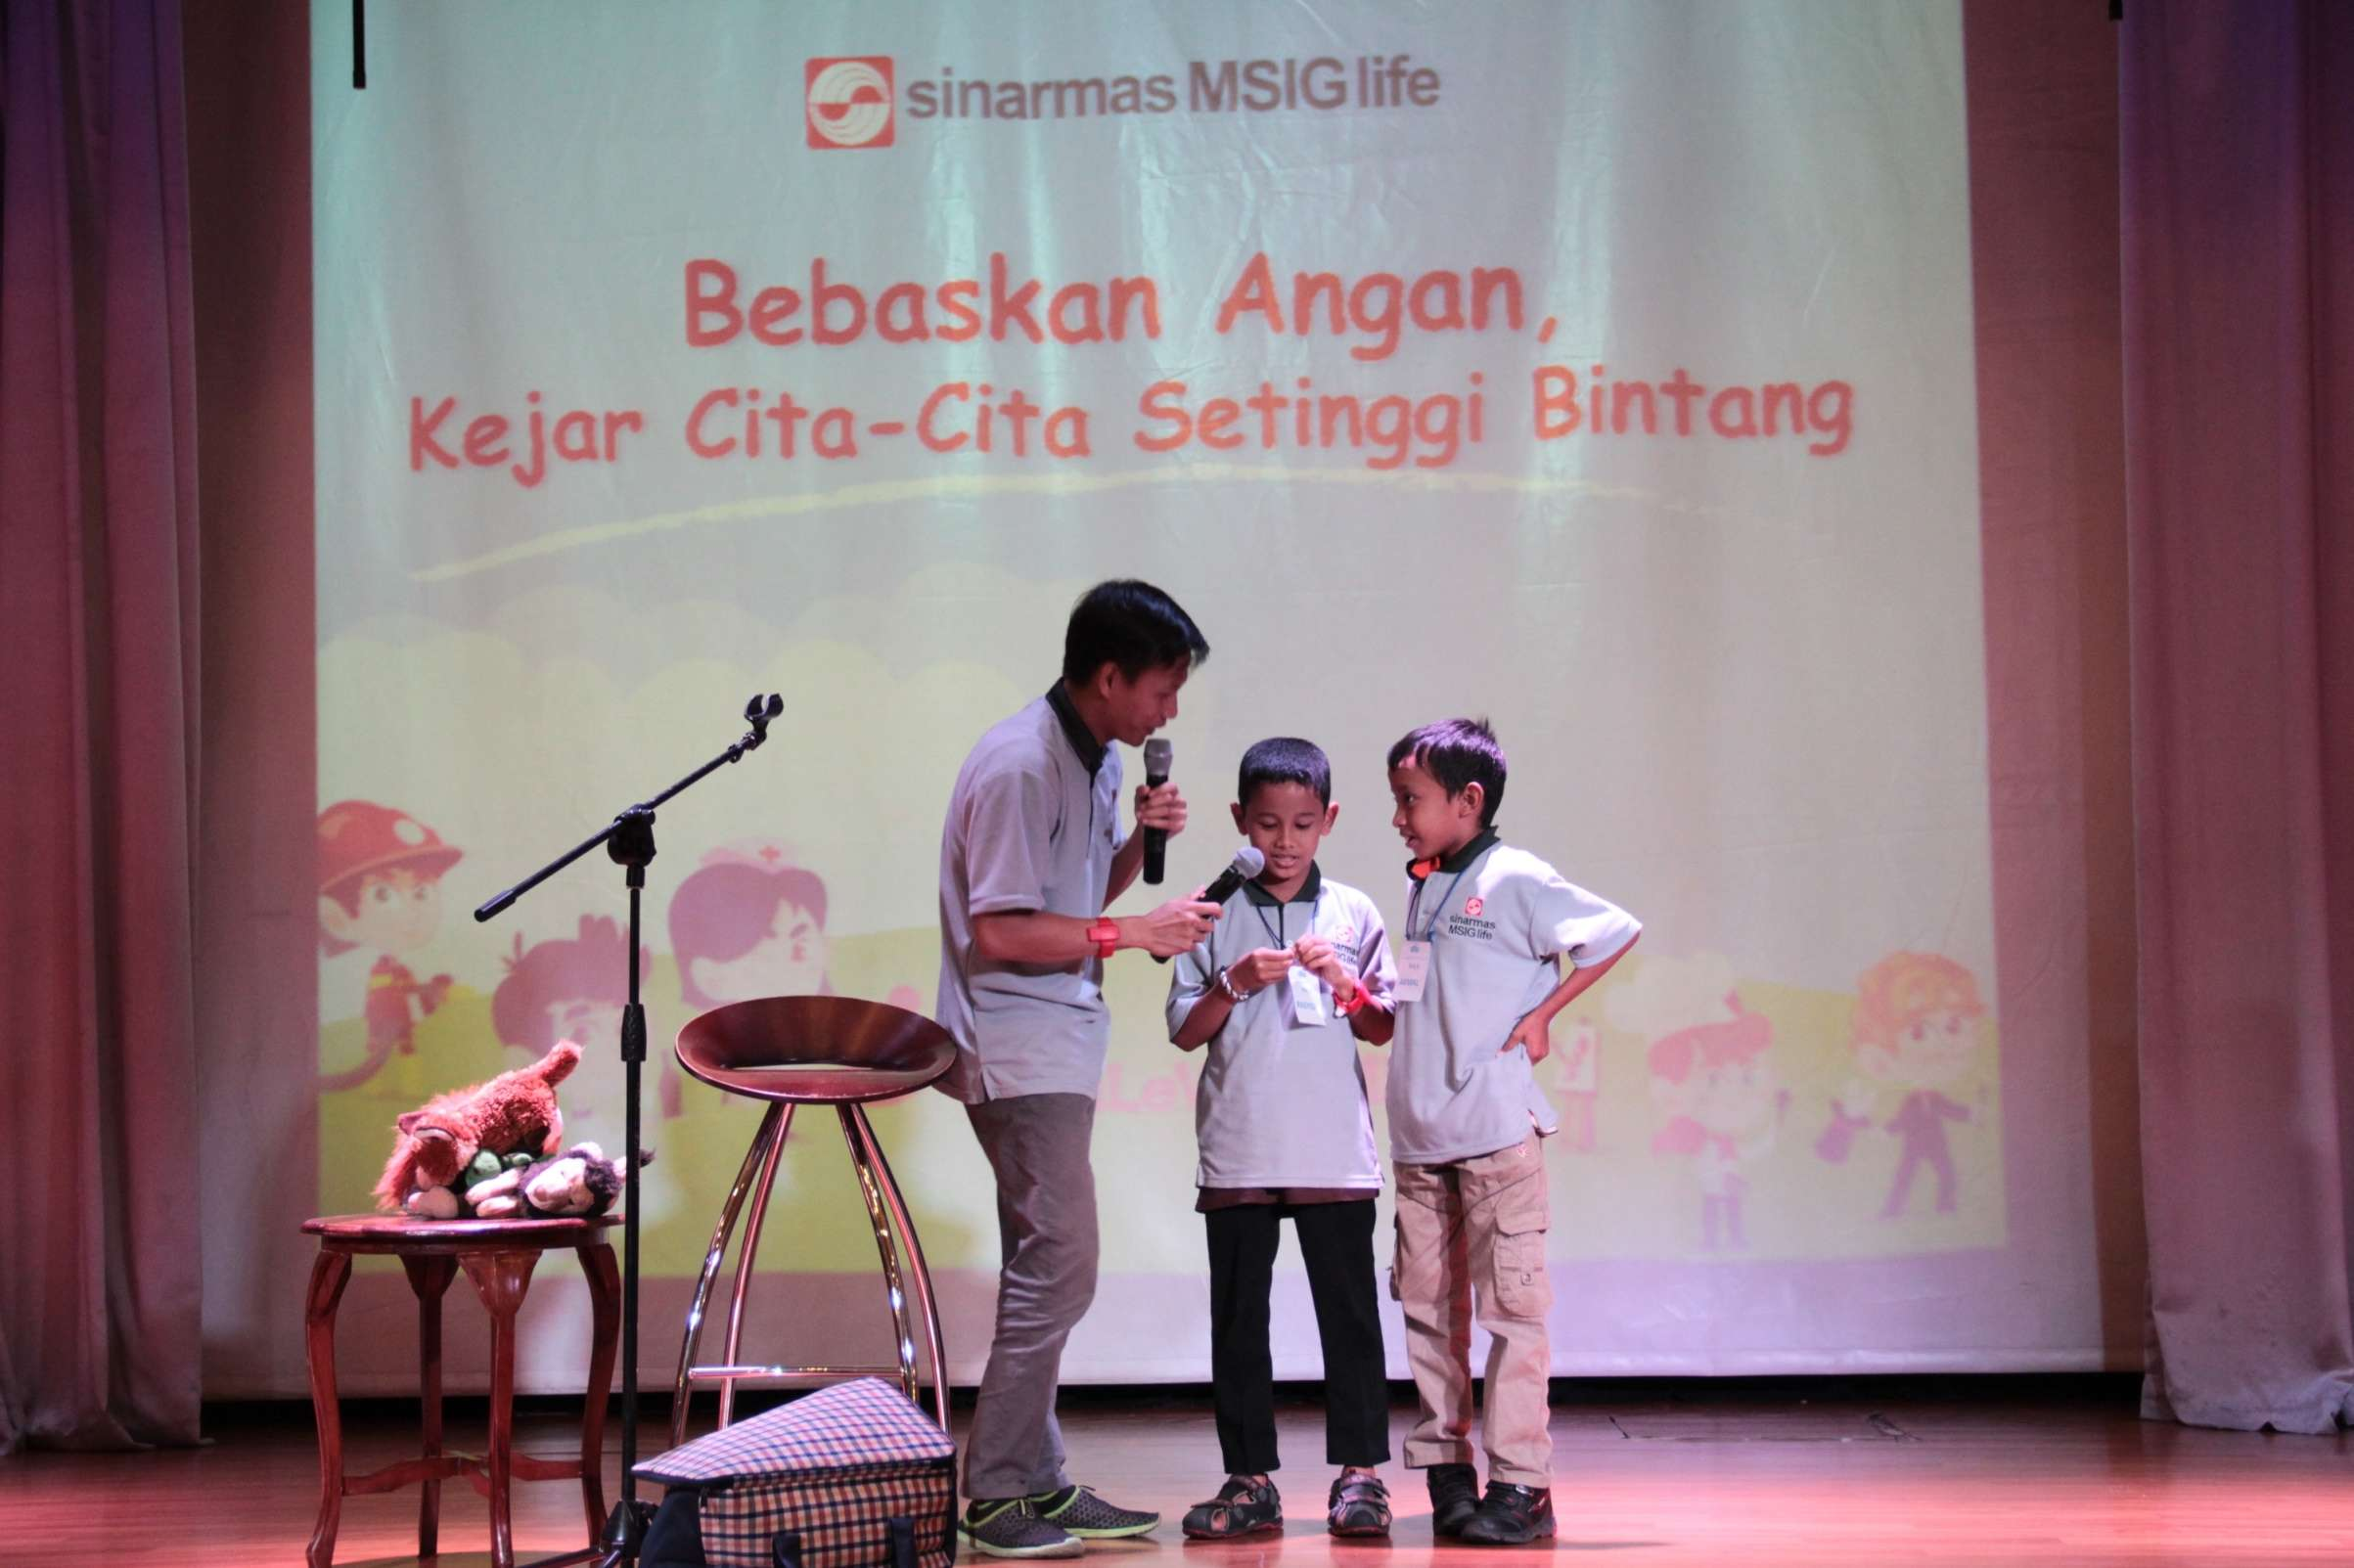 HUT RI 72,Sinarmas MSIG Life Gagas Kegiatan Inspiratif Libatkan Anak-Anak